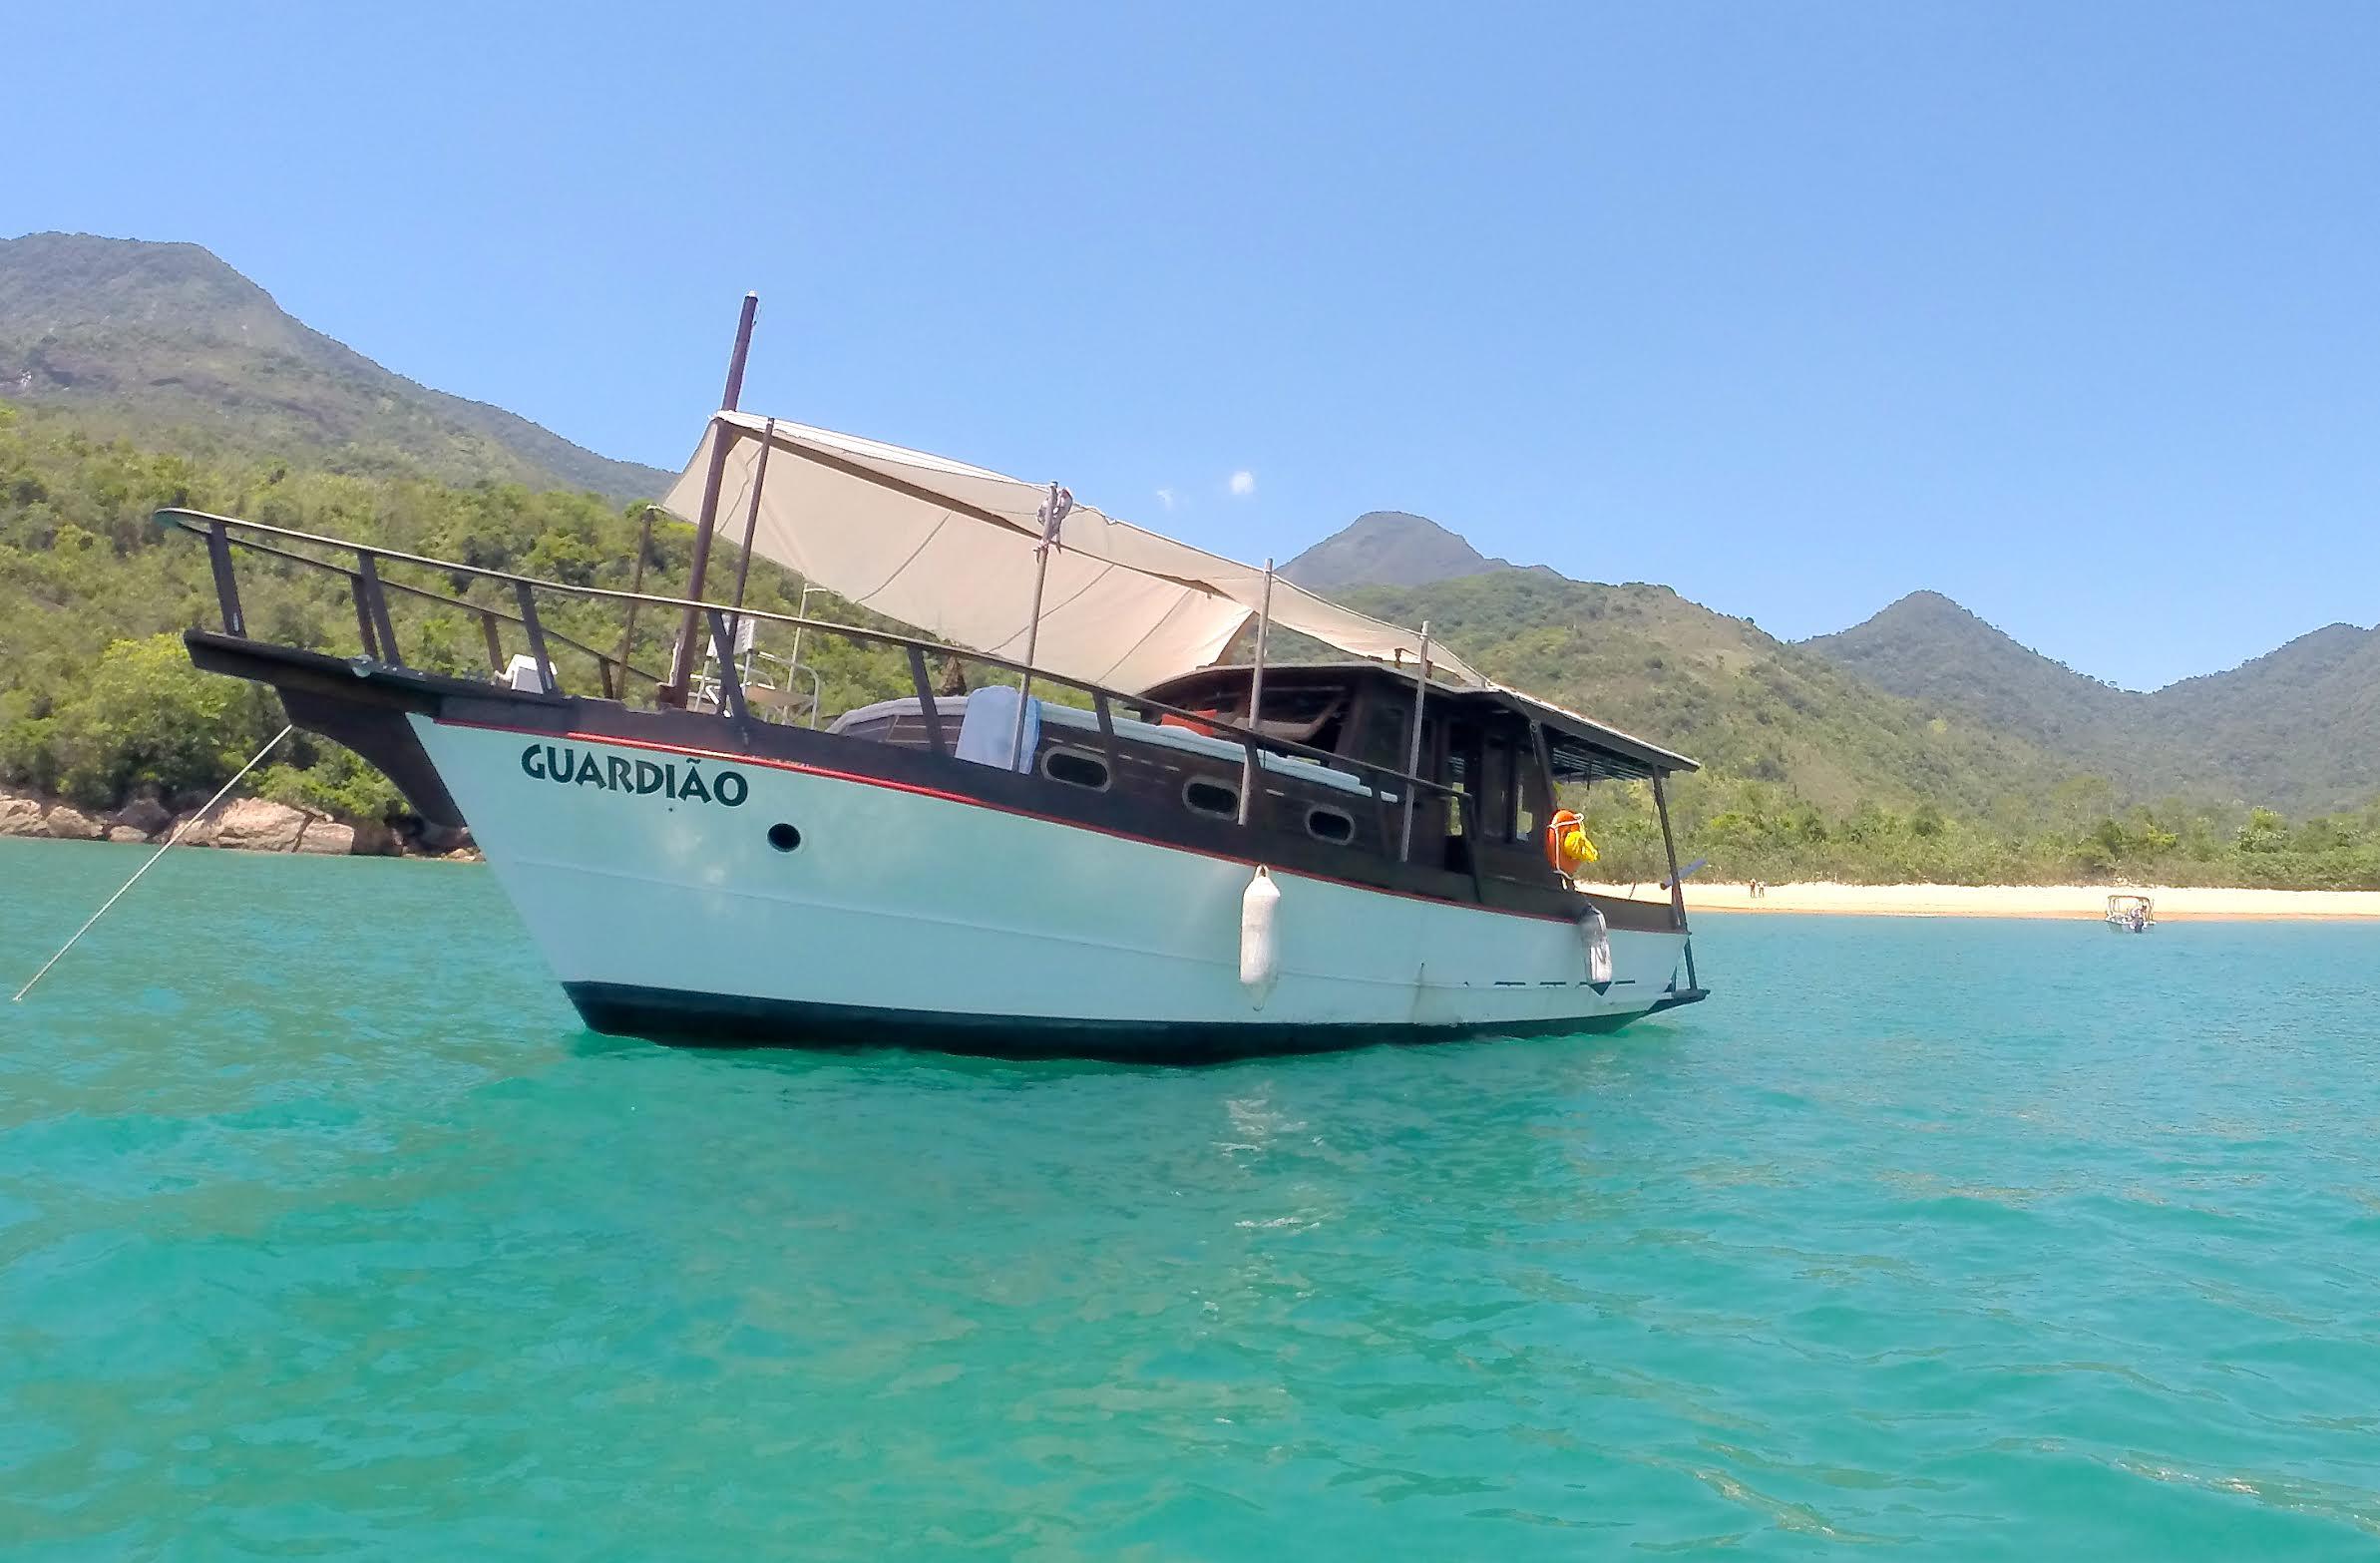 aluguel-barco-paraty-026